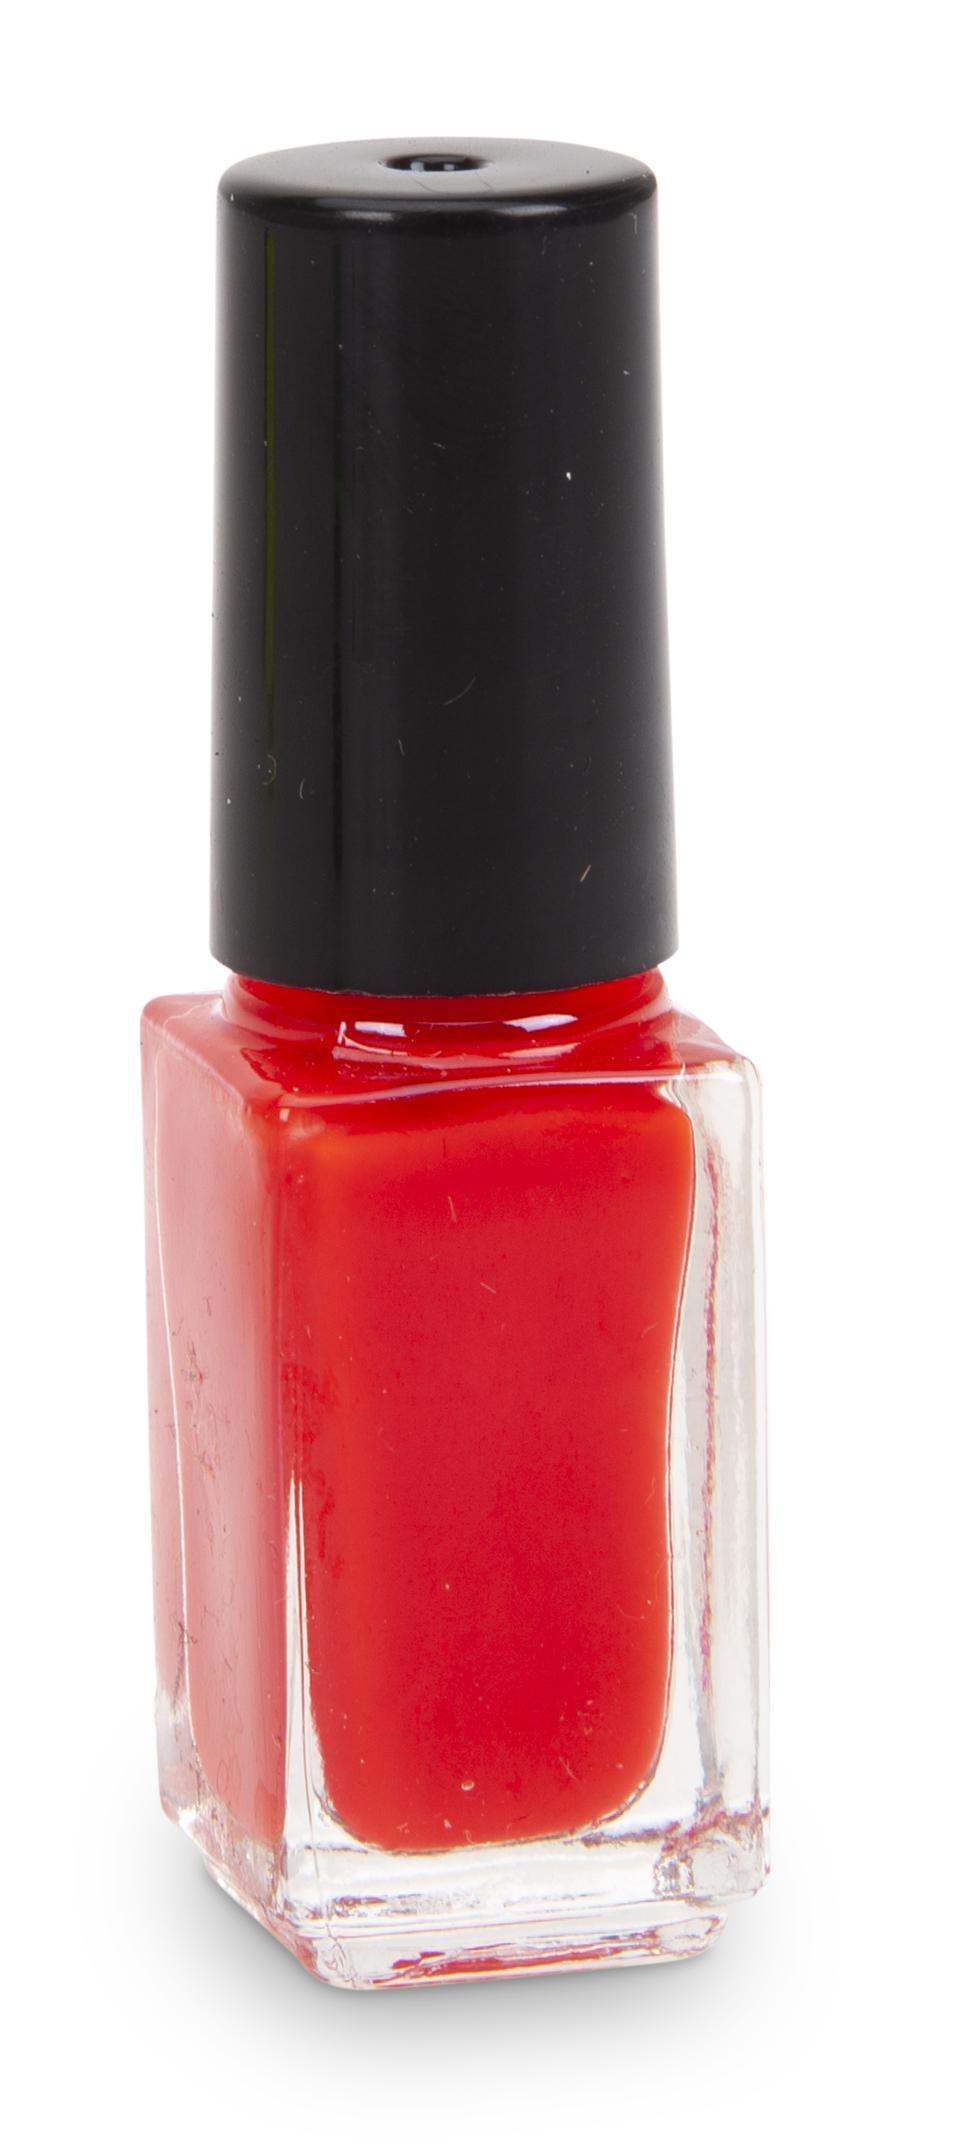 Značkovač Anaconda Line Marker - červená